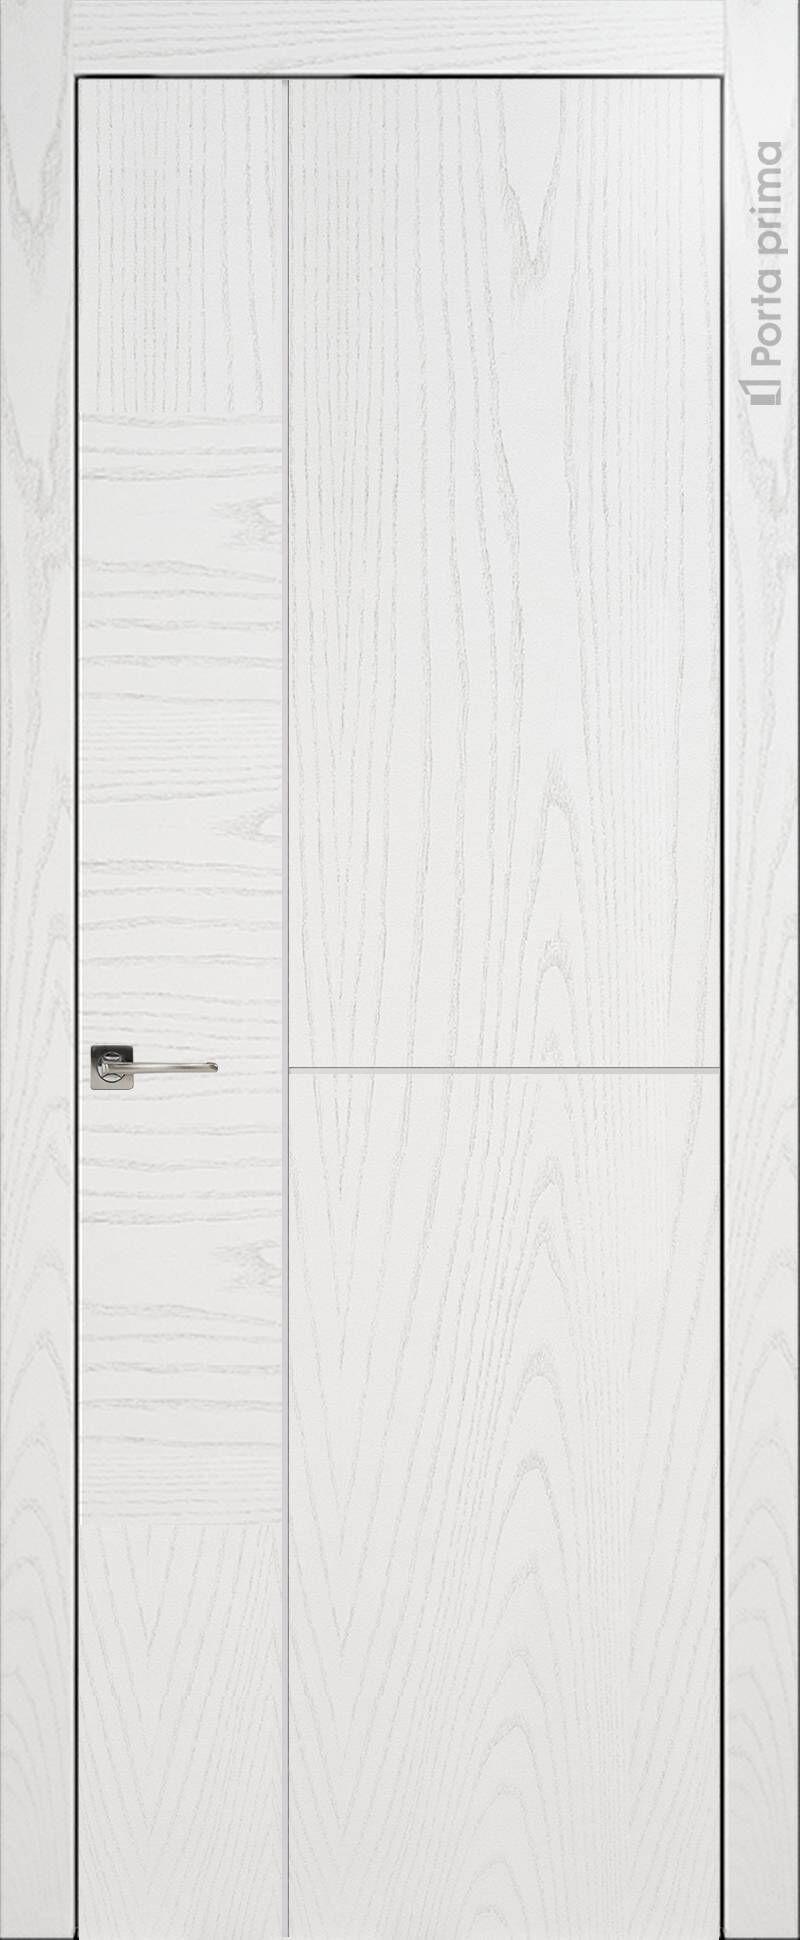 Tivoli Г-1 цвет - Белый ясень (шпон) Без стекла (ДГ)